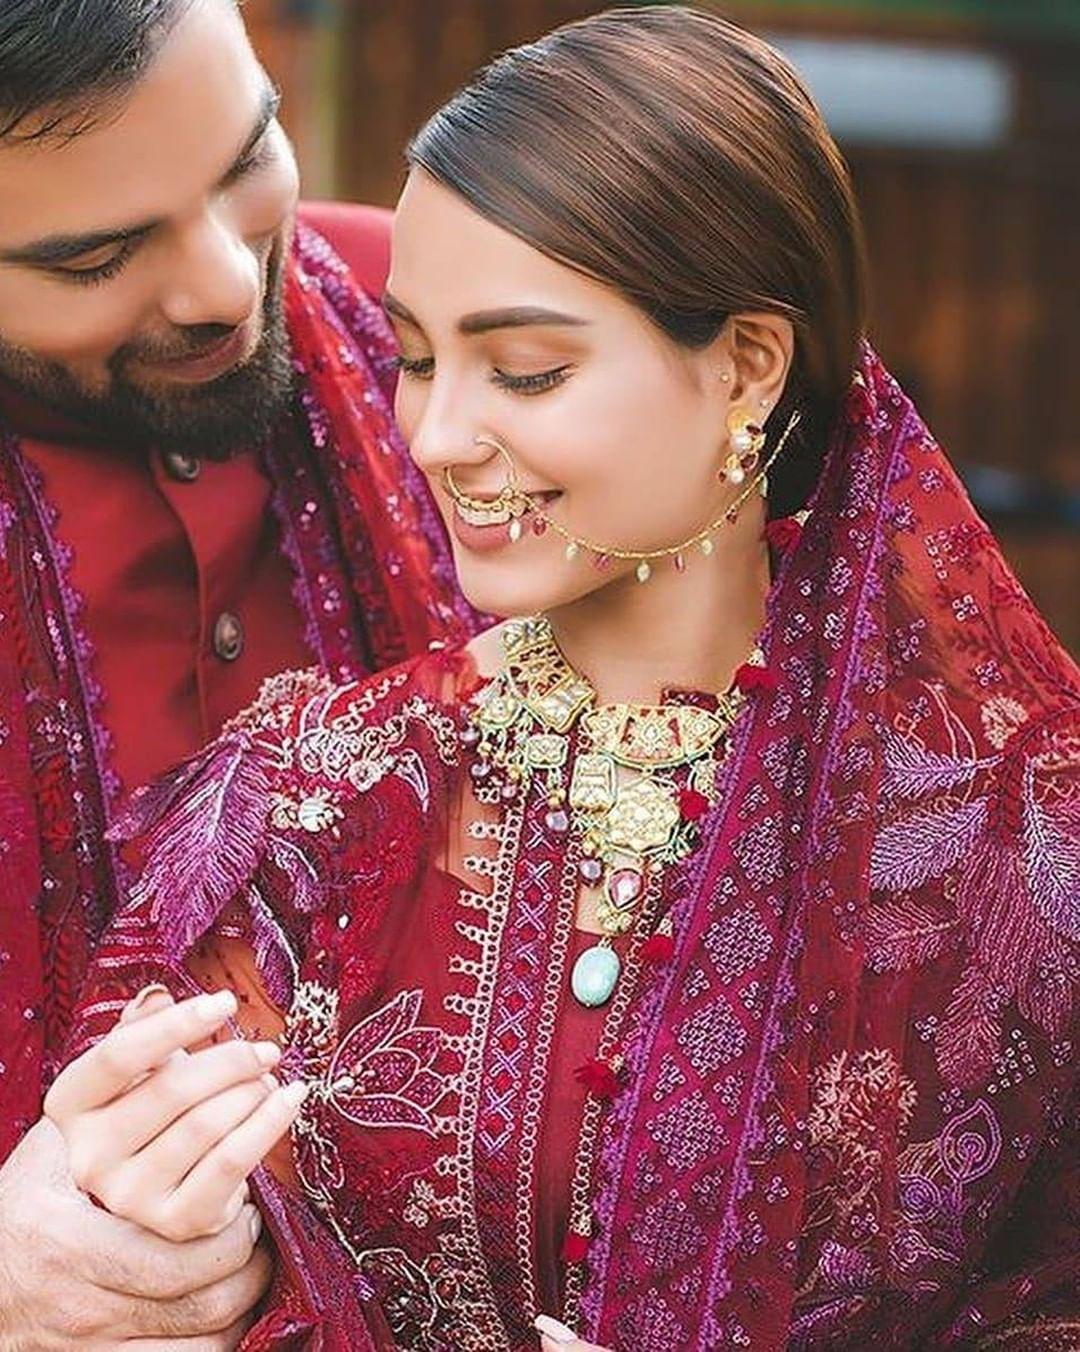 New Awesome Photoshoot of Iqra Aziz and Yasir Hussain